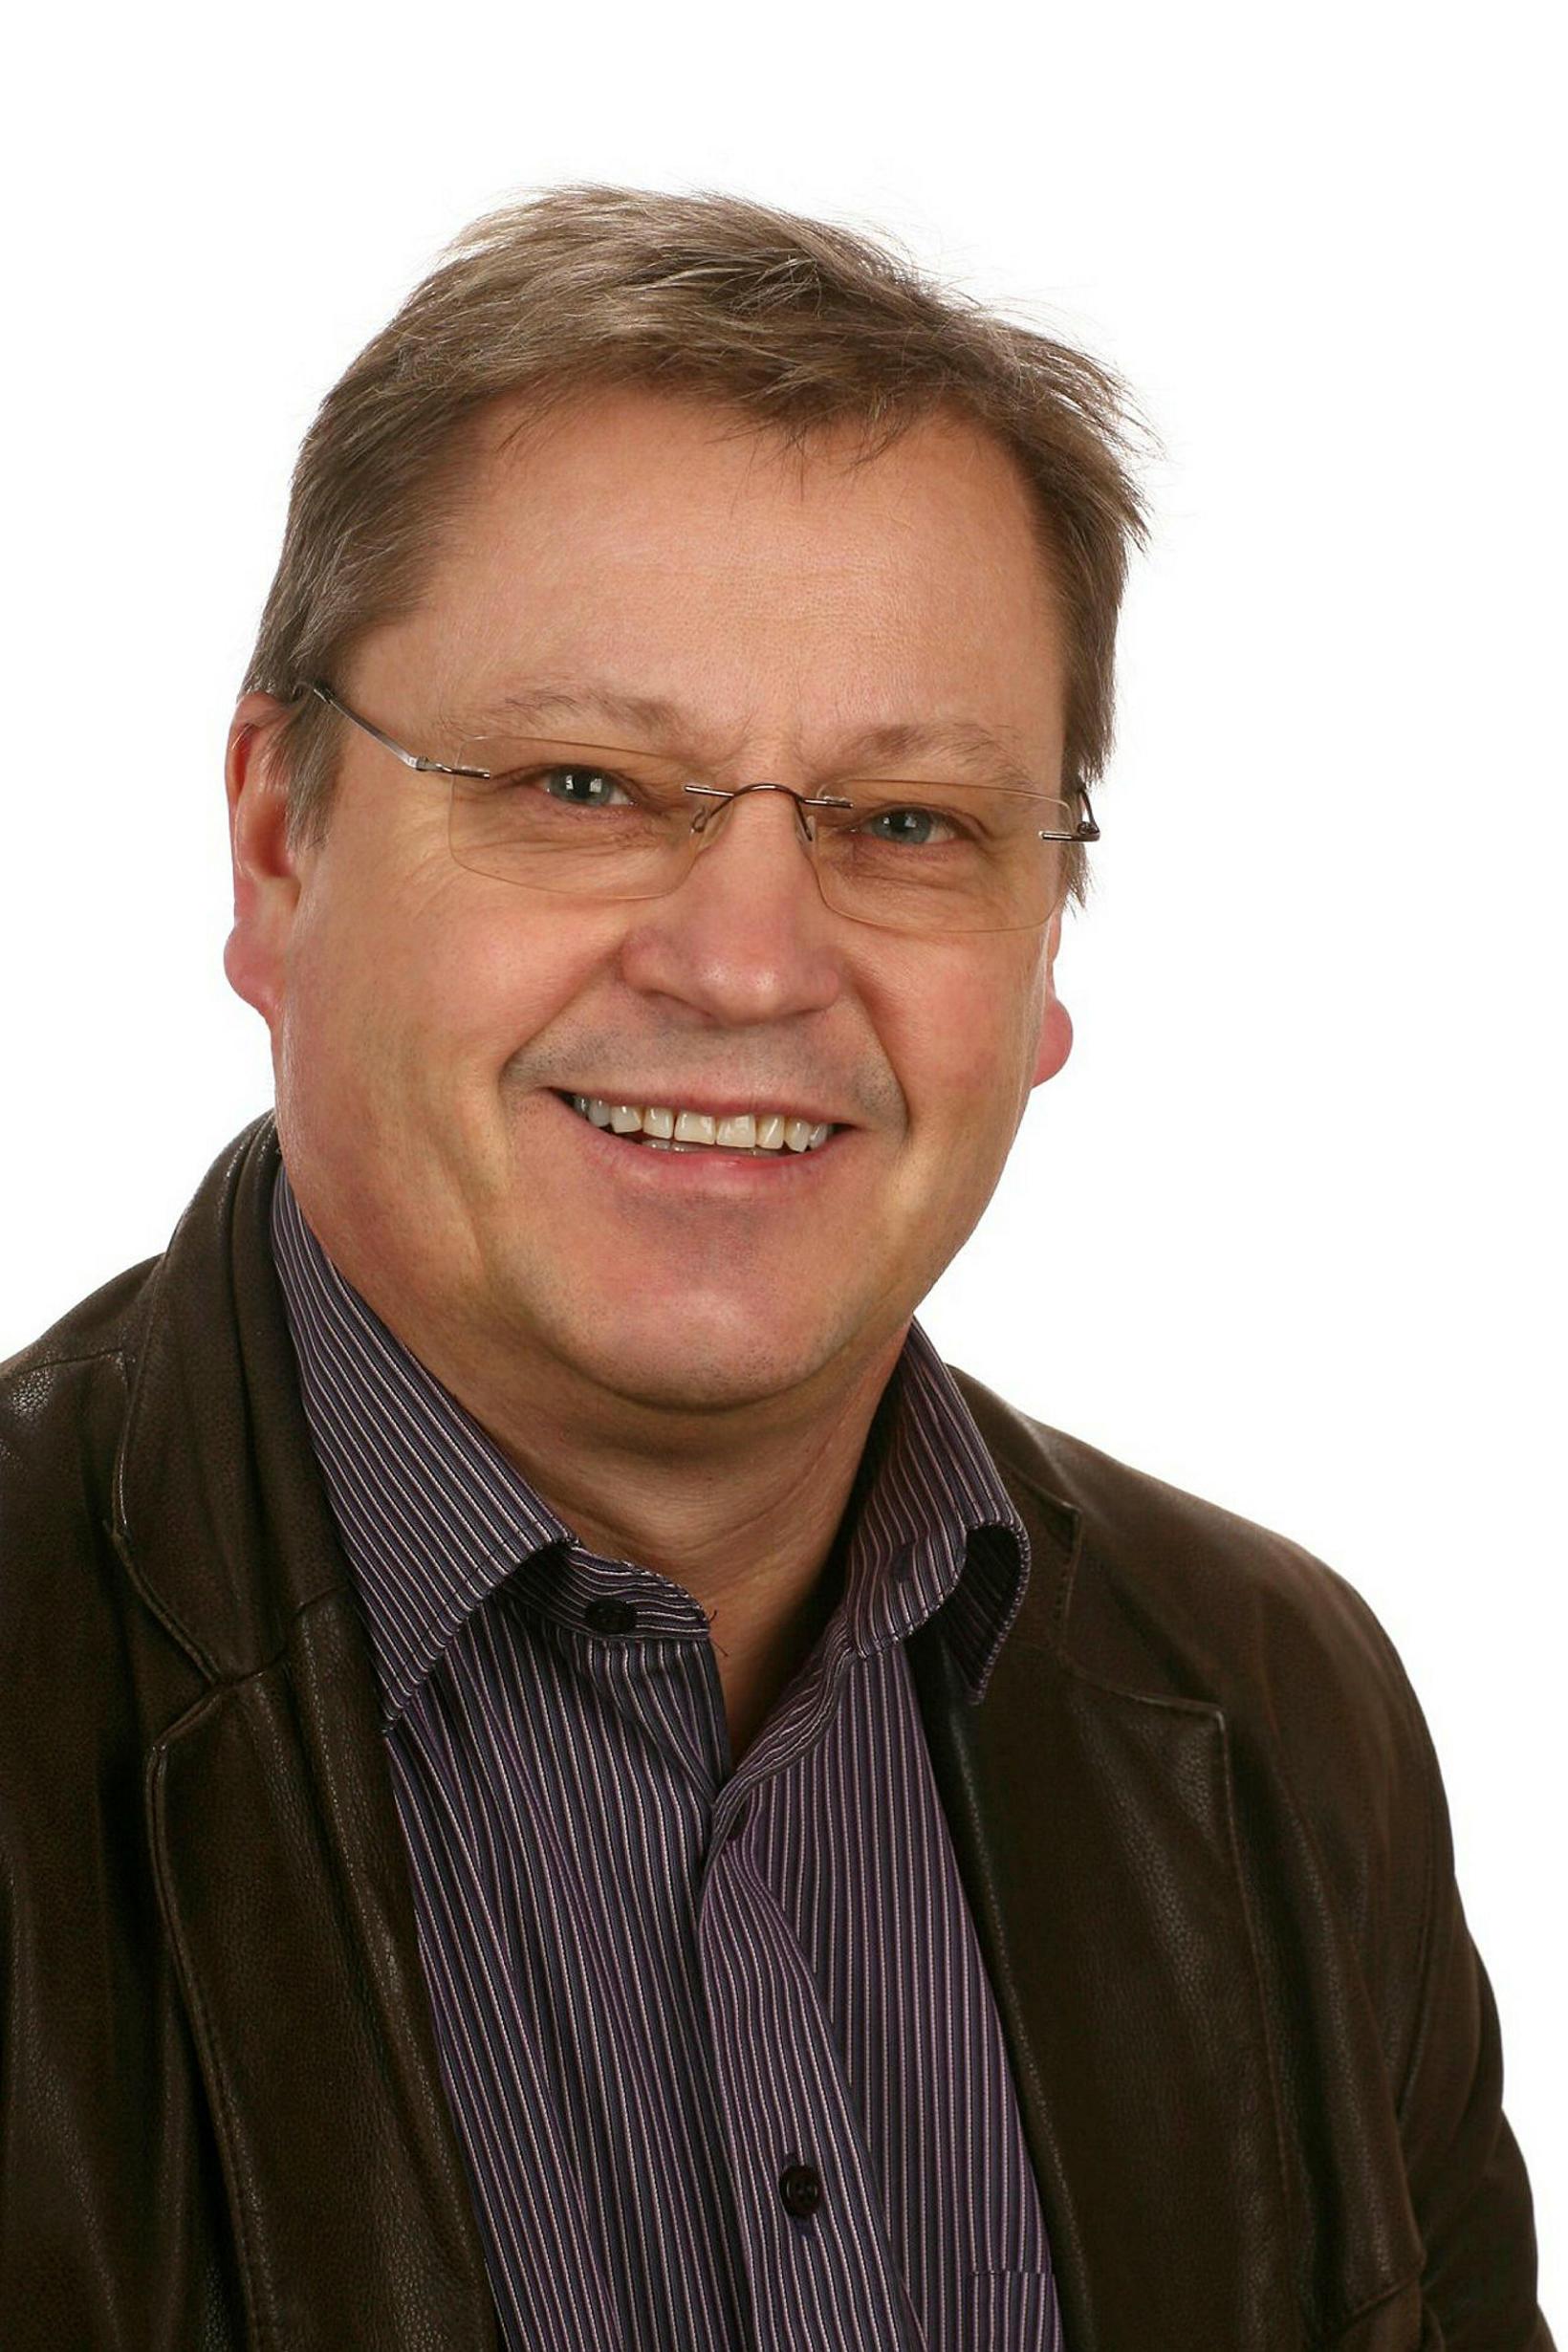 Björn Ingimarsson